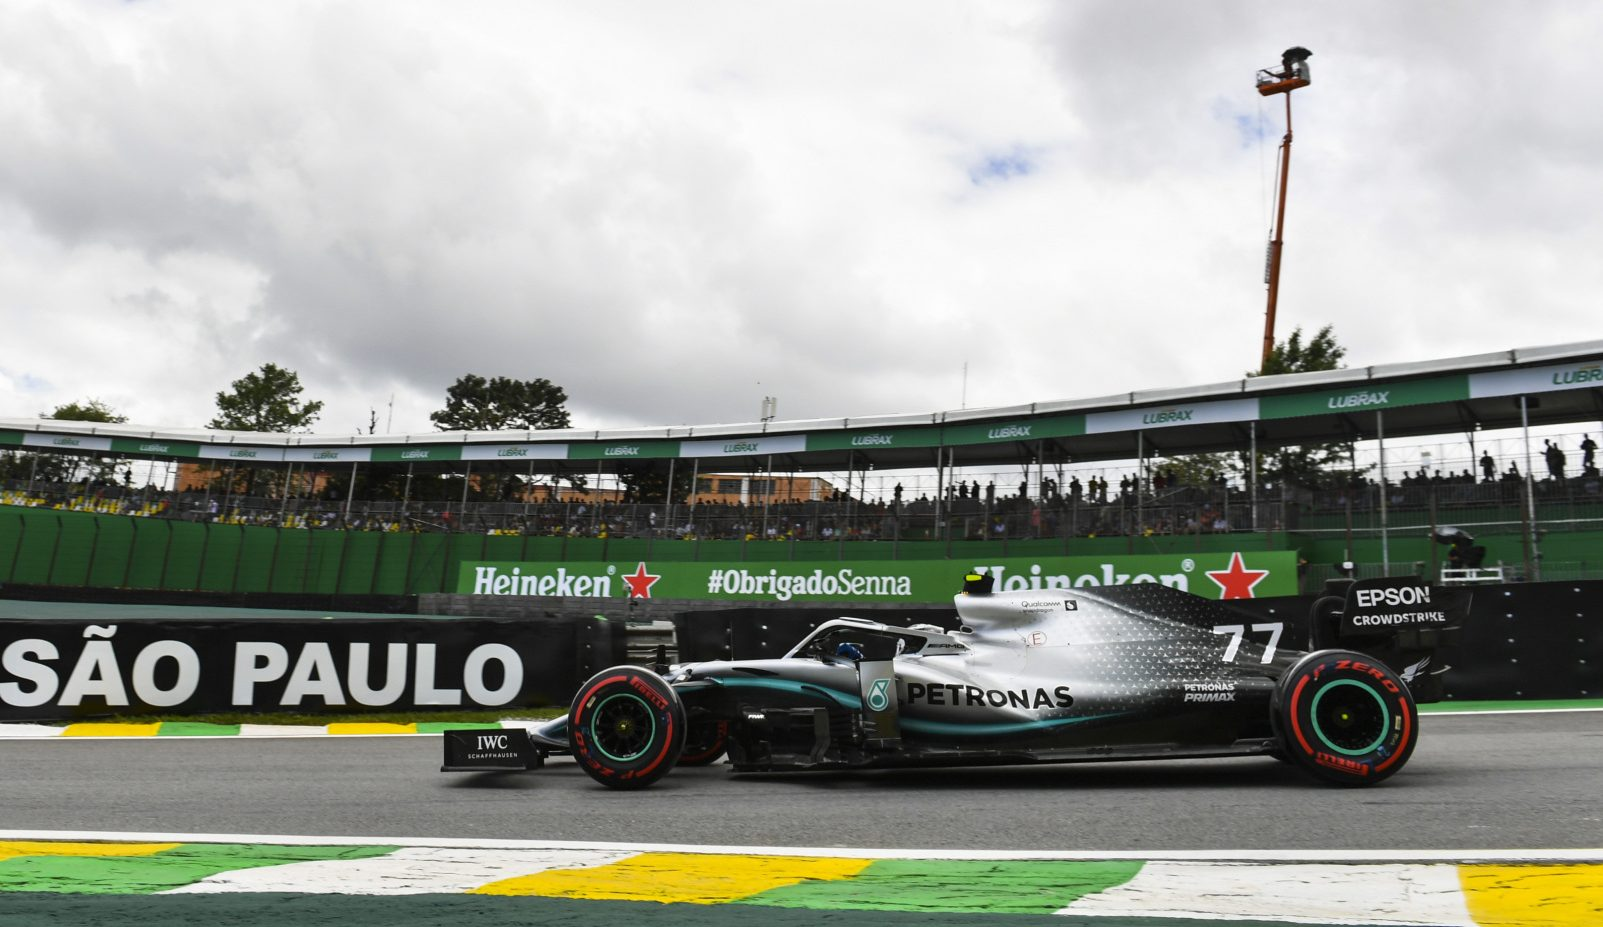 F1 Formula 1 Formula One Mercedes Valtteri Bottas Brazilian Grand Prix abu dhabi